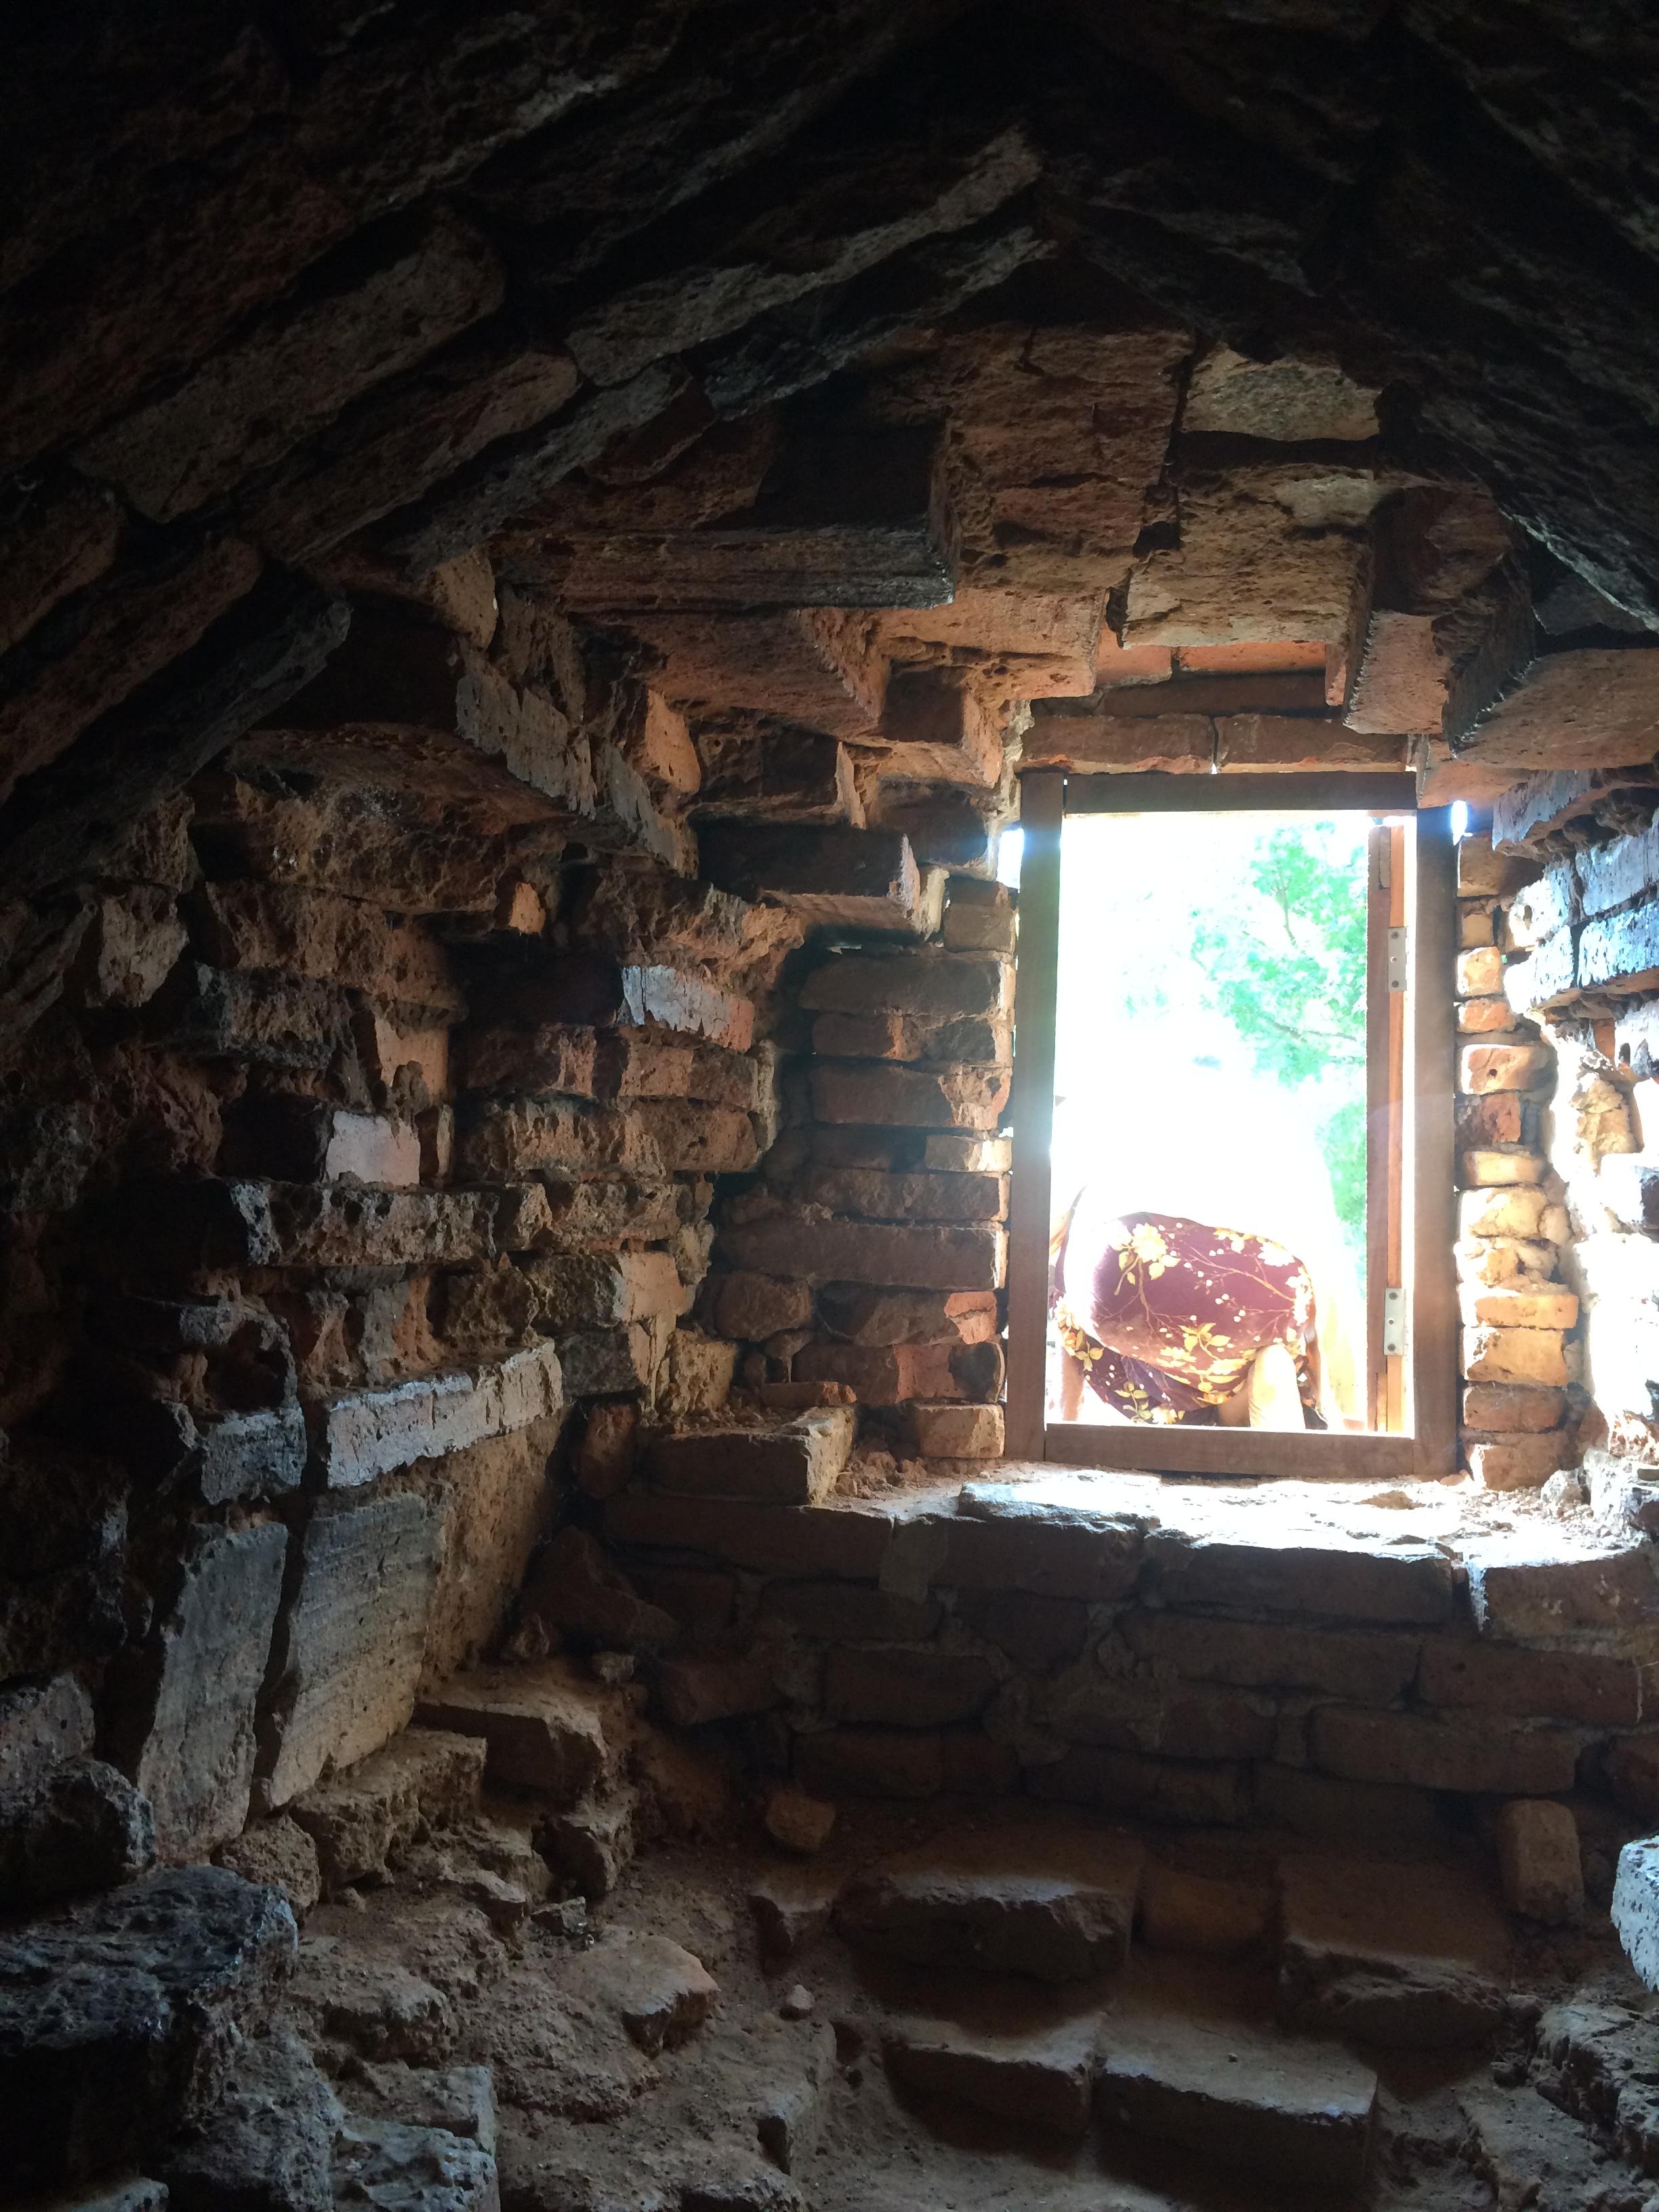 Deep inside the bat cave